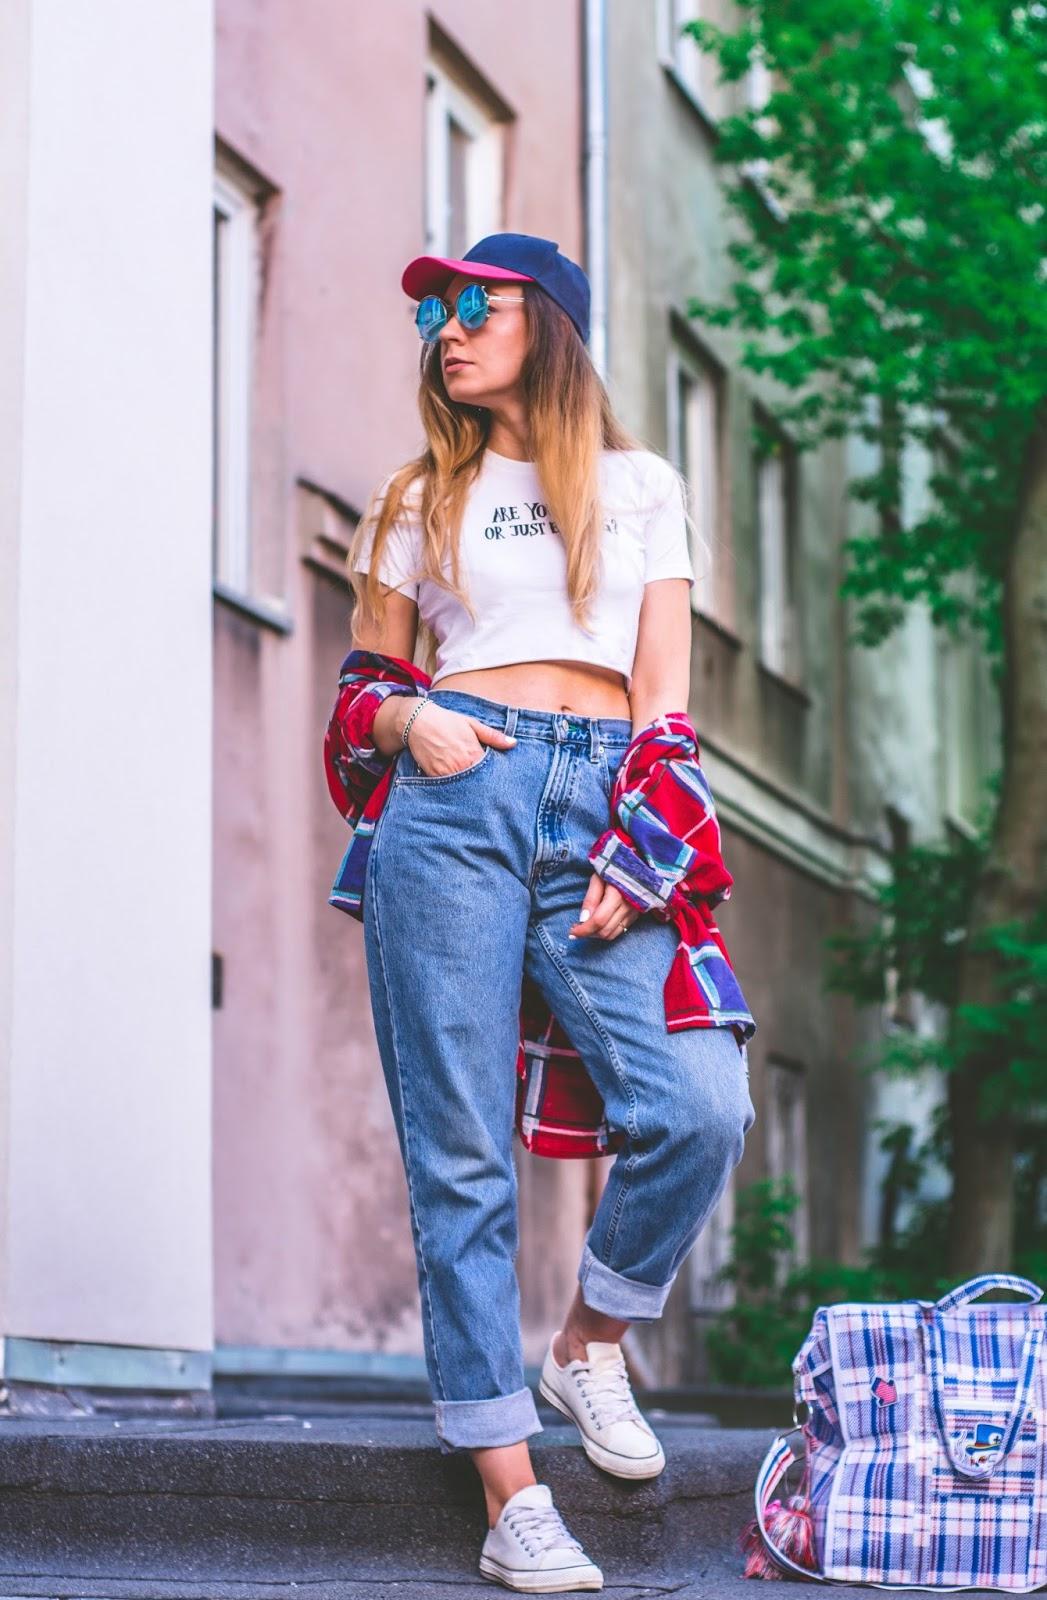 vintage jeans and crop top